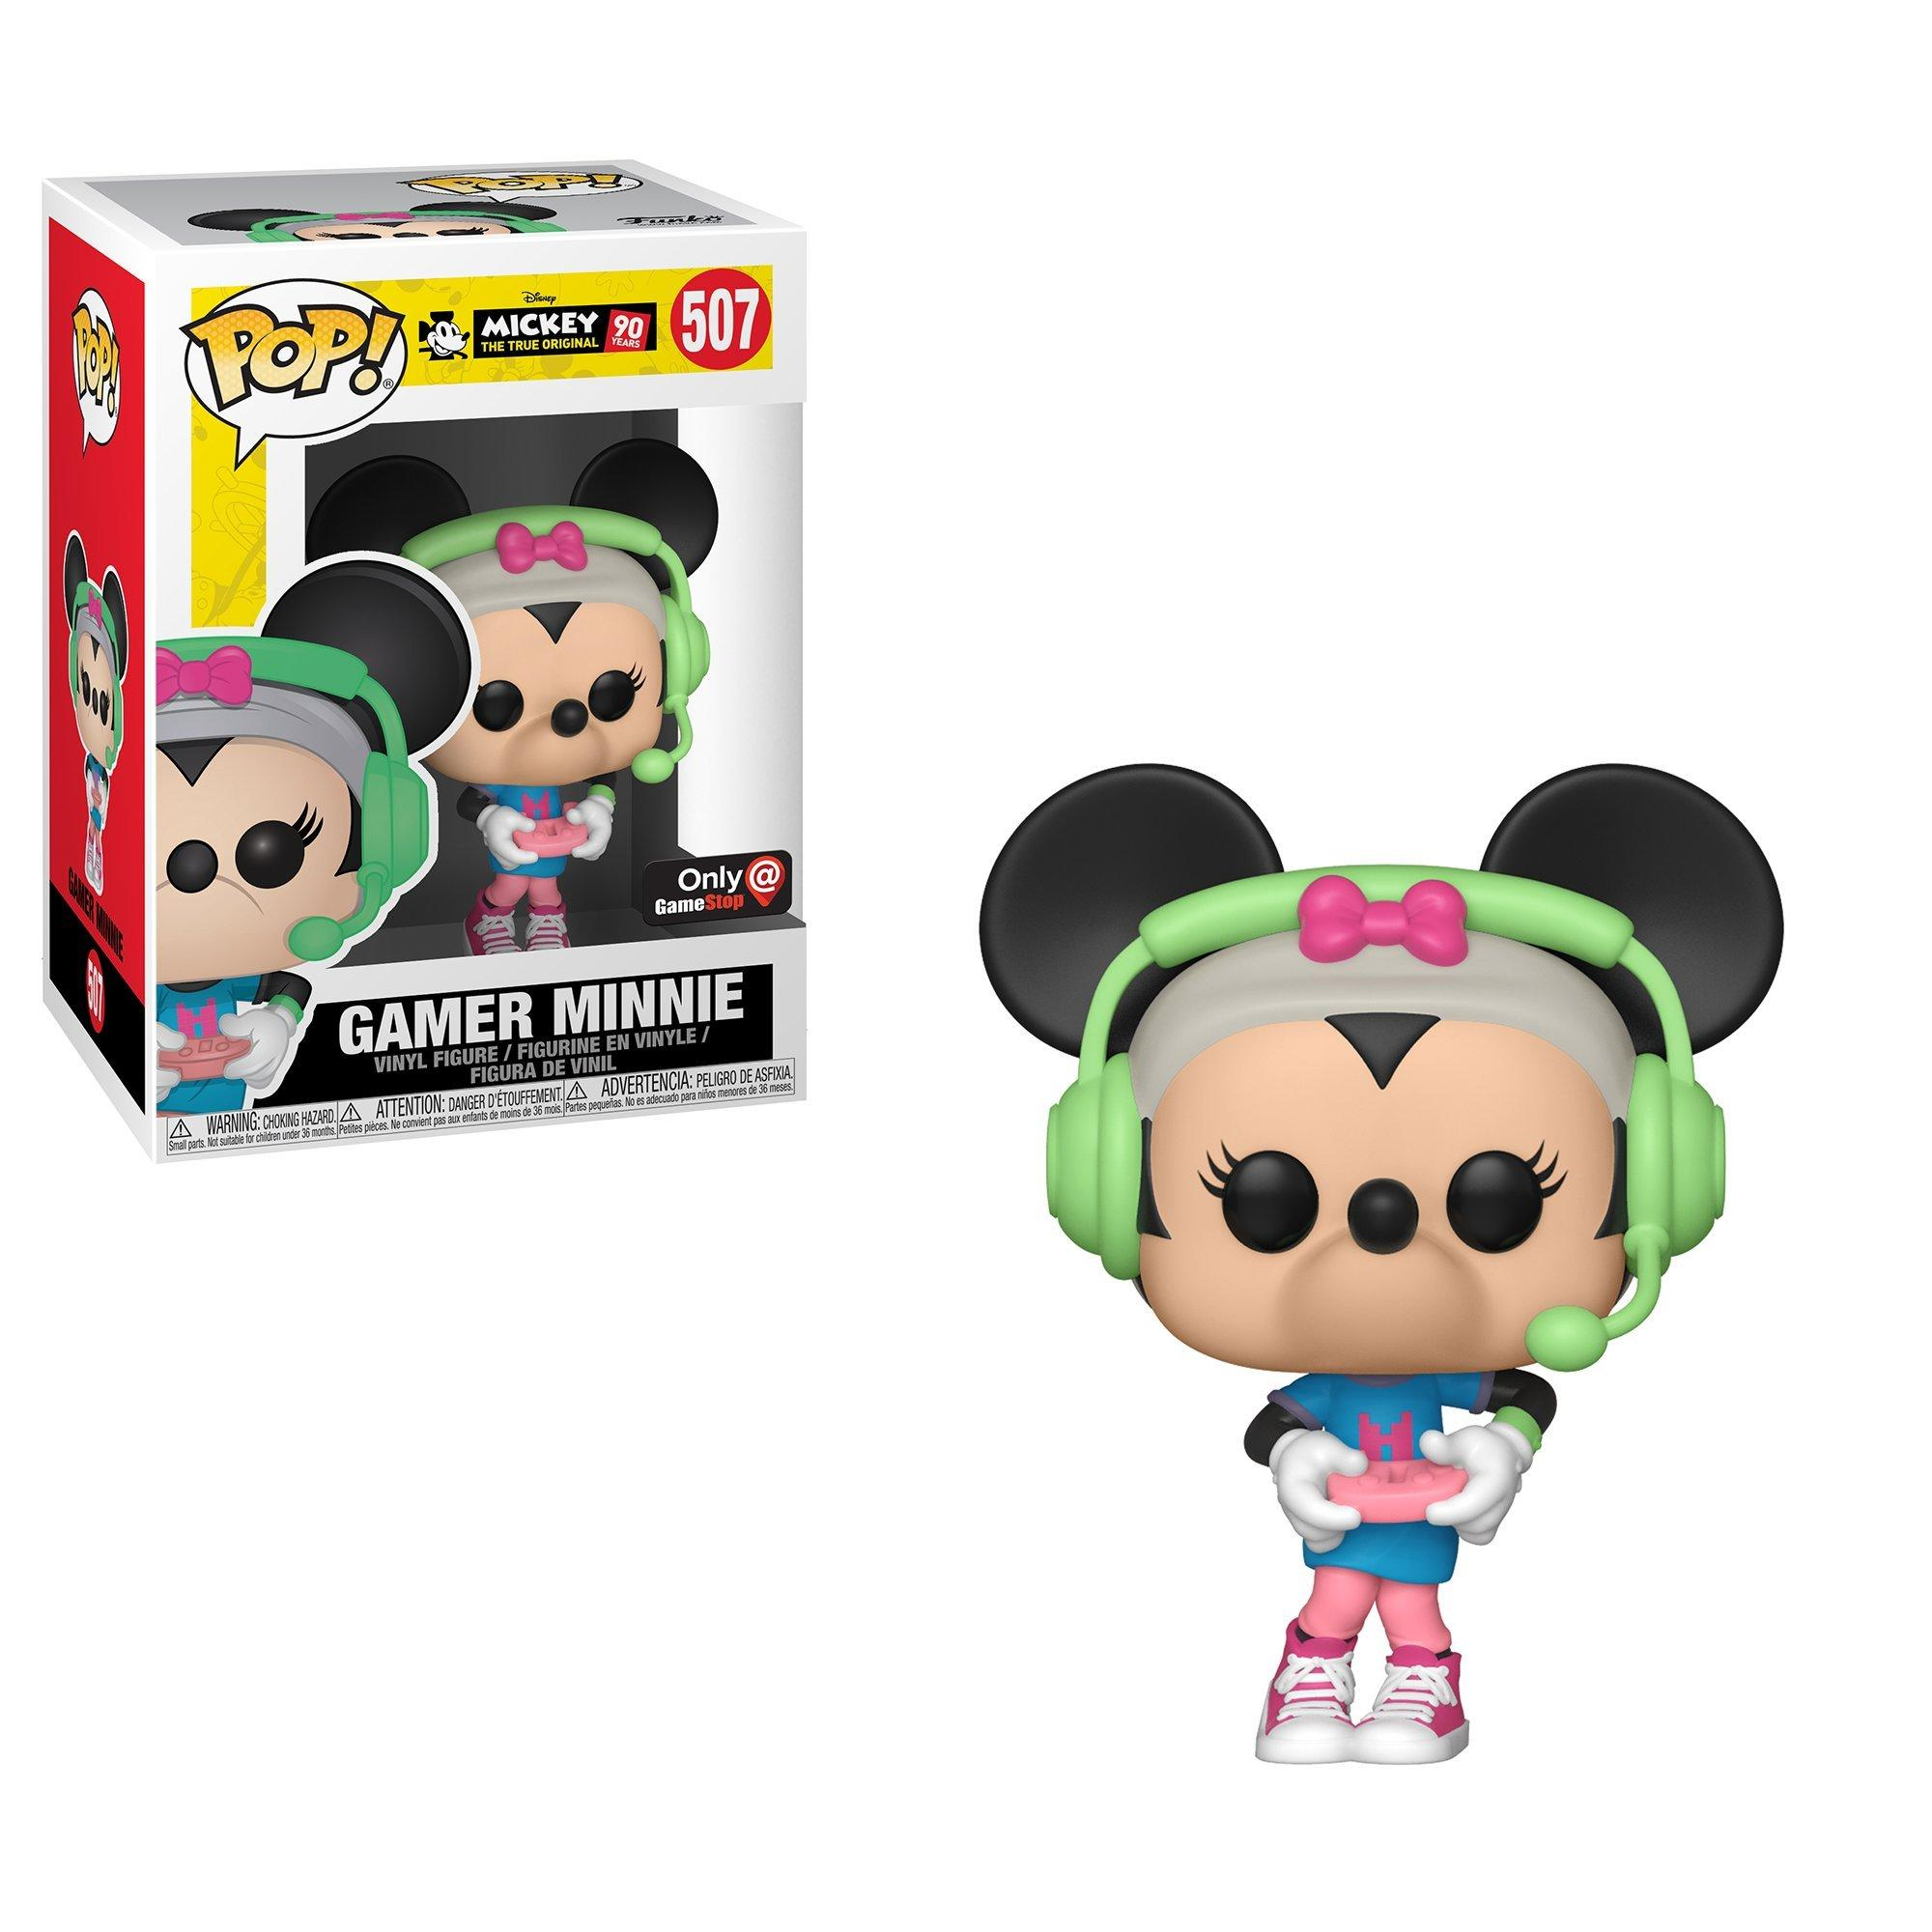 Pop Disney Mickey 90 Years Gamer Minnie Only At Gamestop Gamestop